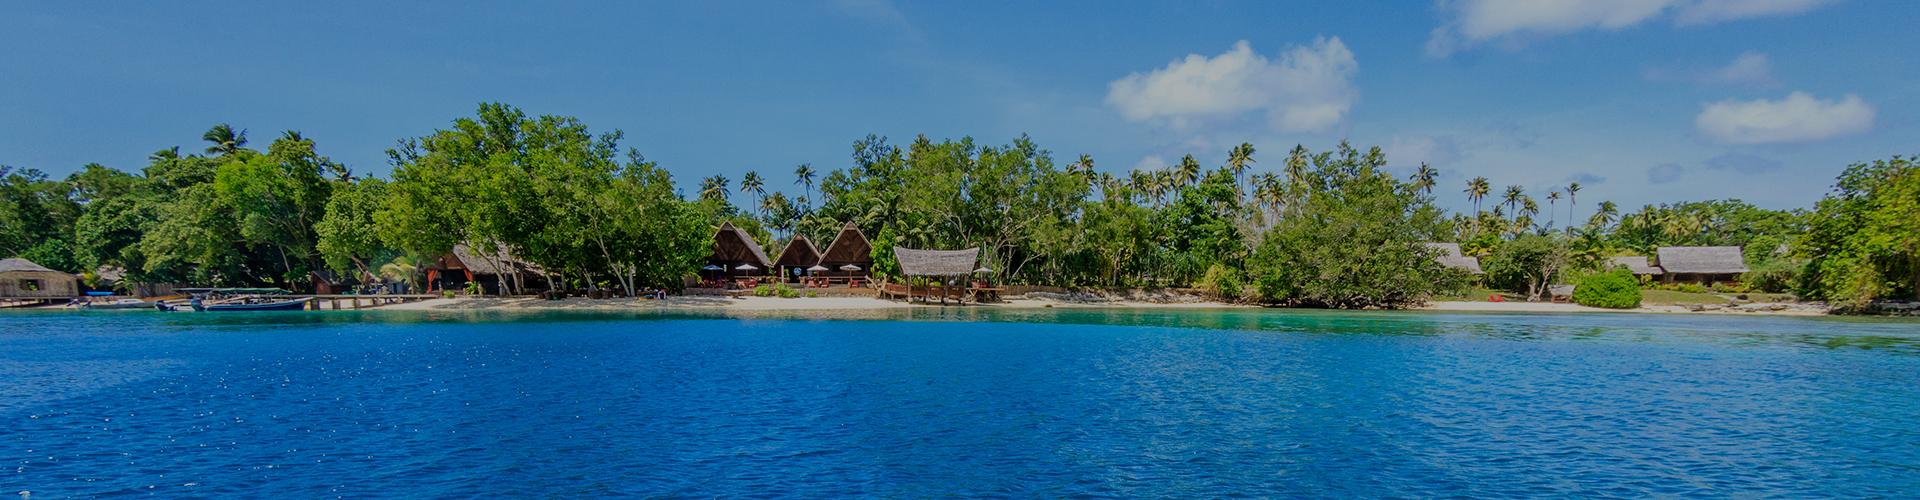 Landmark photograph of Vanuatu